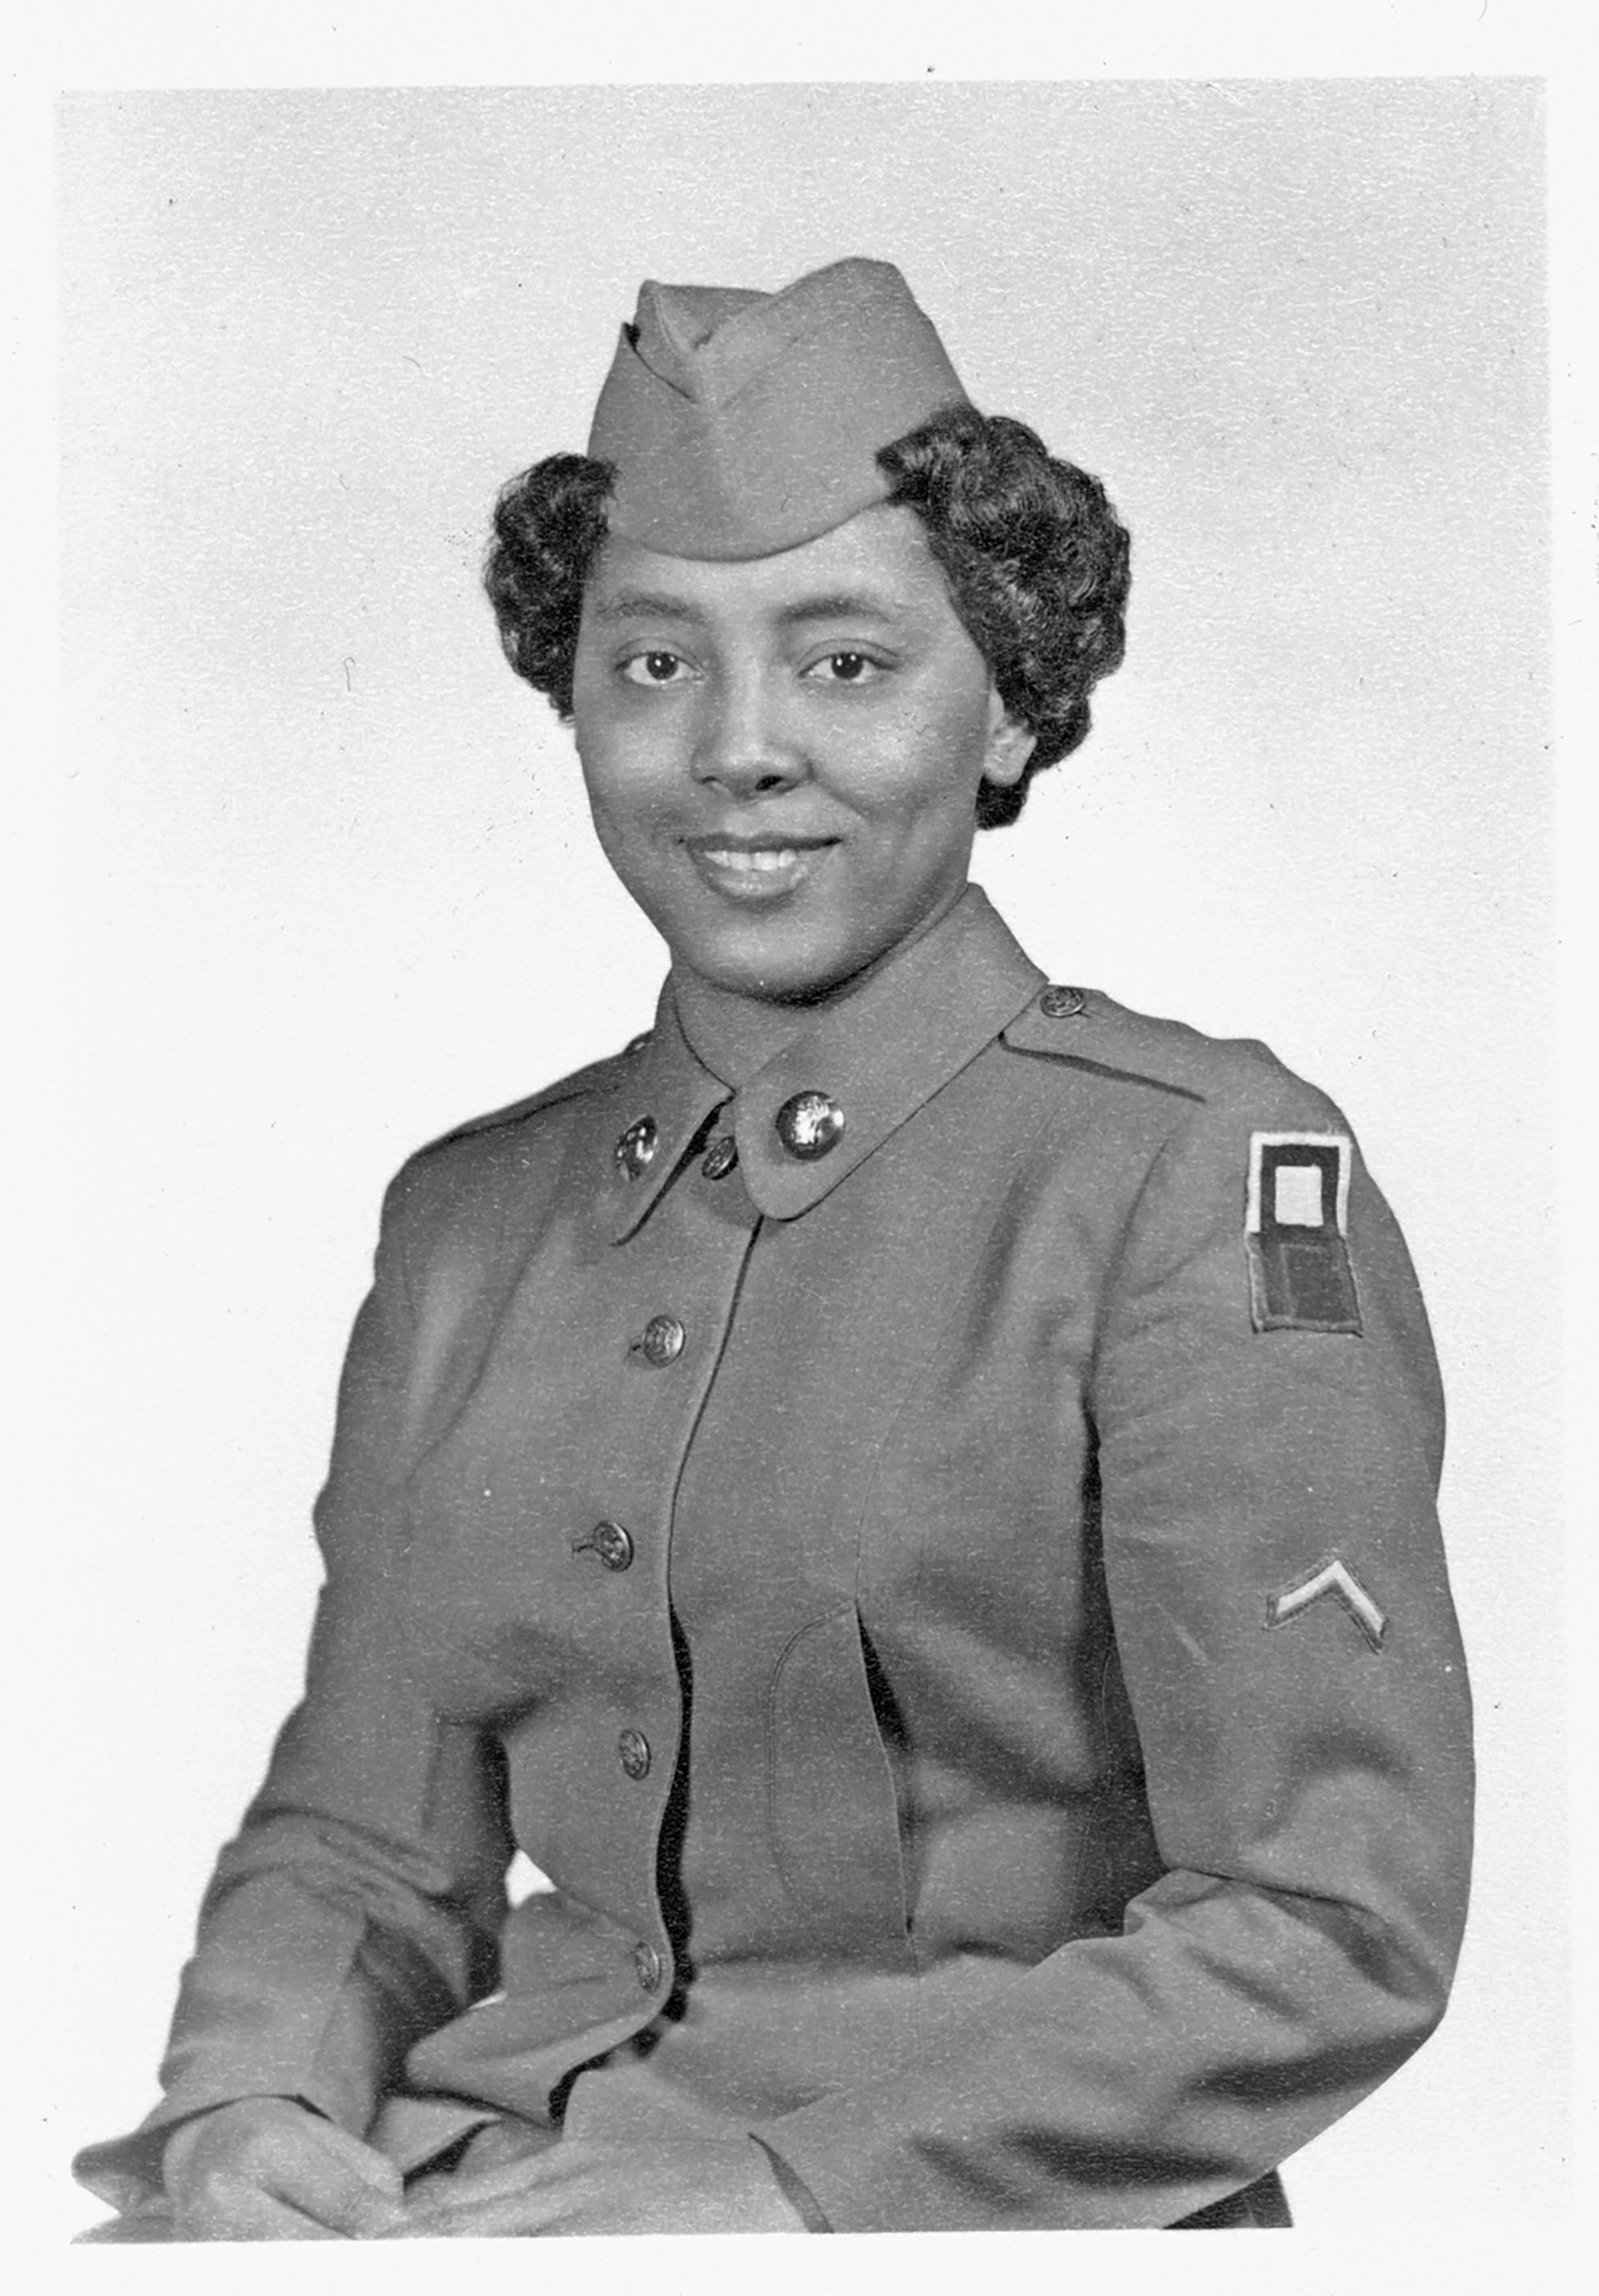 Private Sarah Keys, circa 1952.